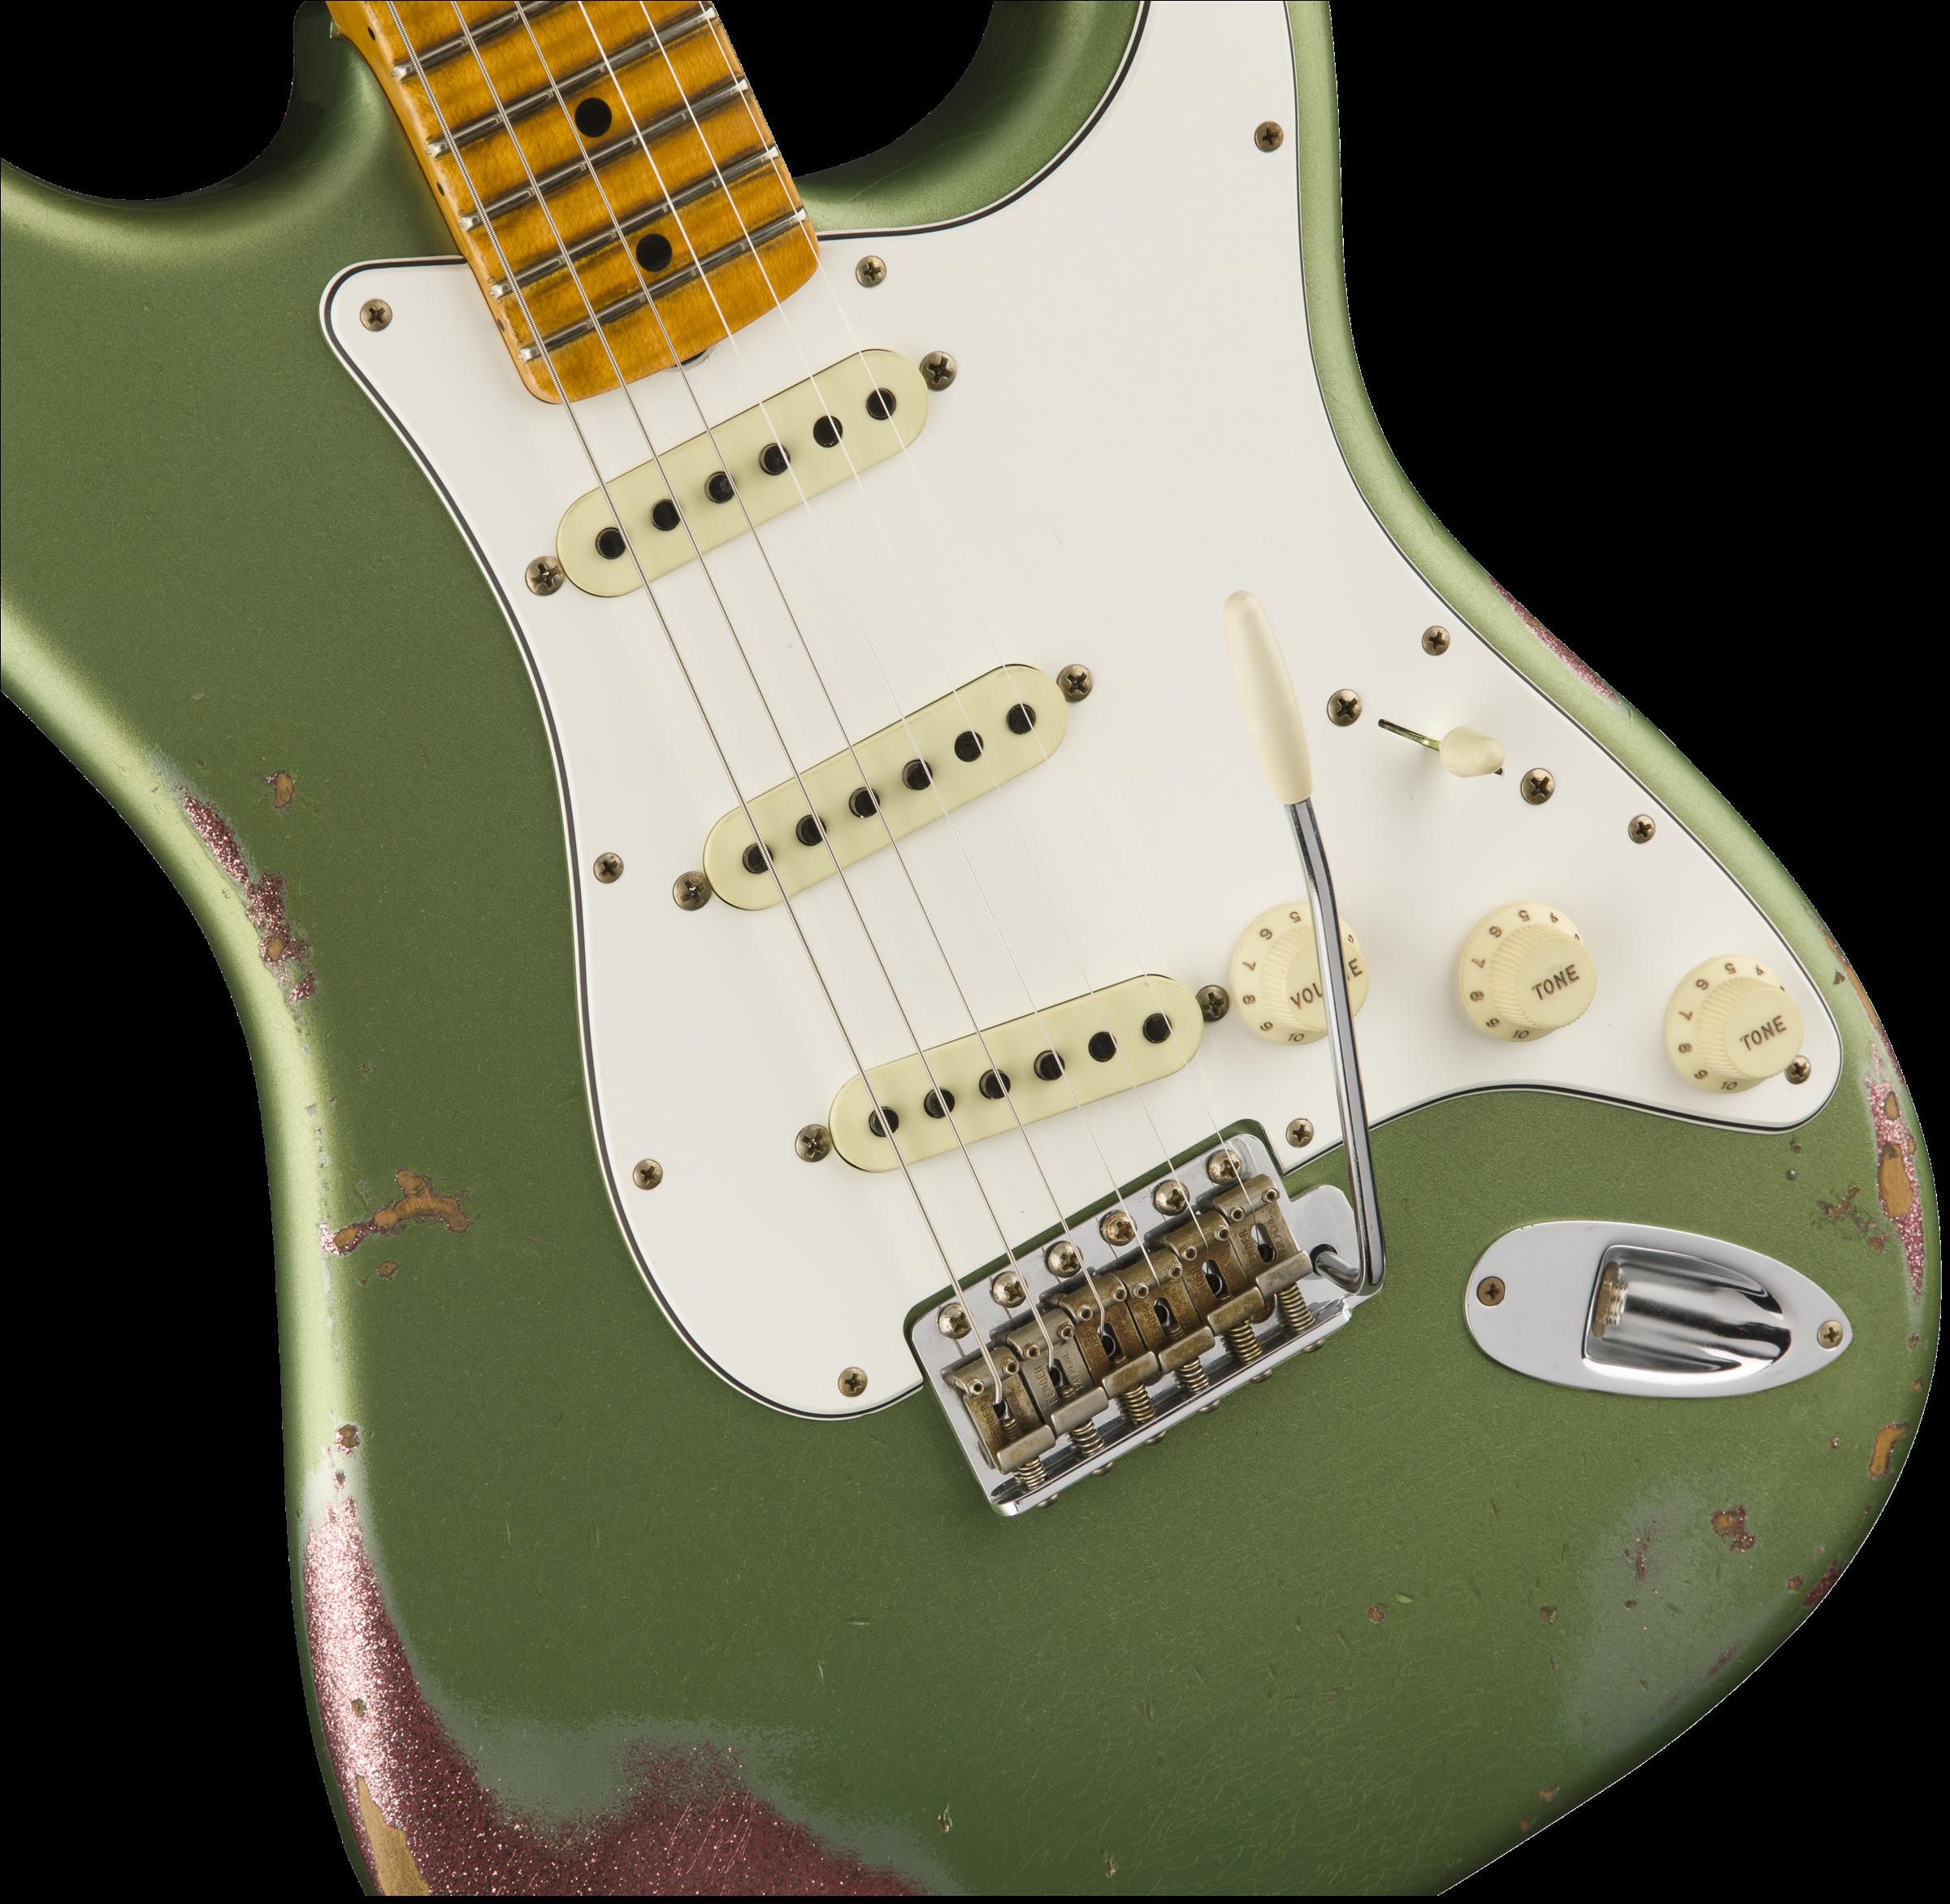 Fender Custom Shop 2017 Ltd '64 Special' Strat – Relic